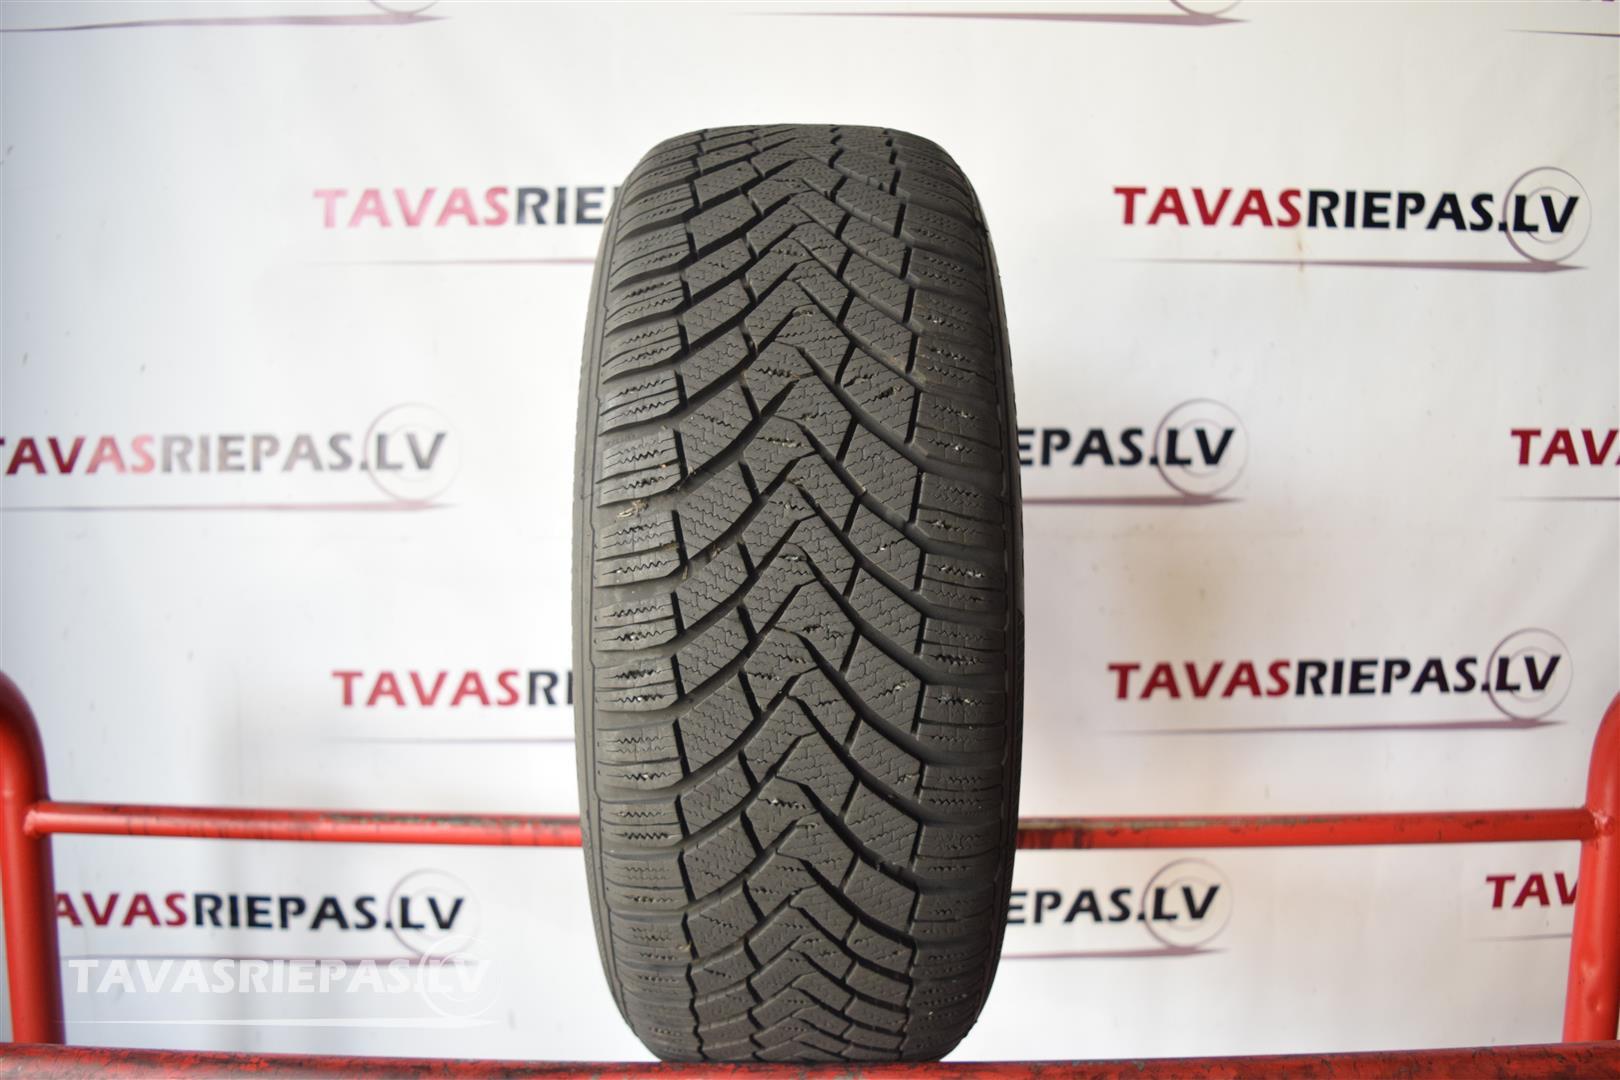 tires continental conti winter contact ts850 225 50 r17. Black Bedroom Furniture Sets. Home Design Ideas